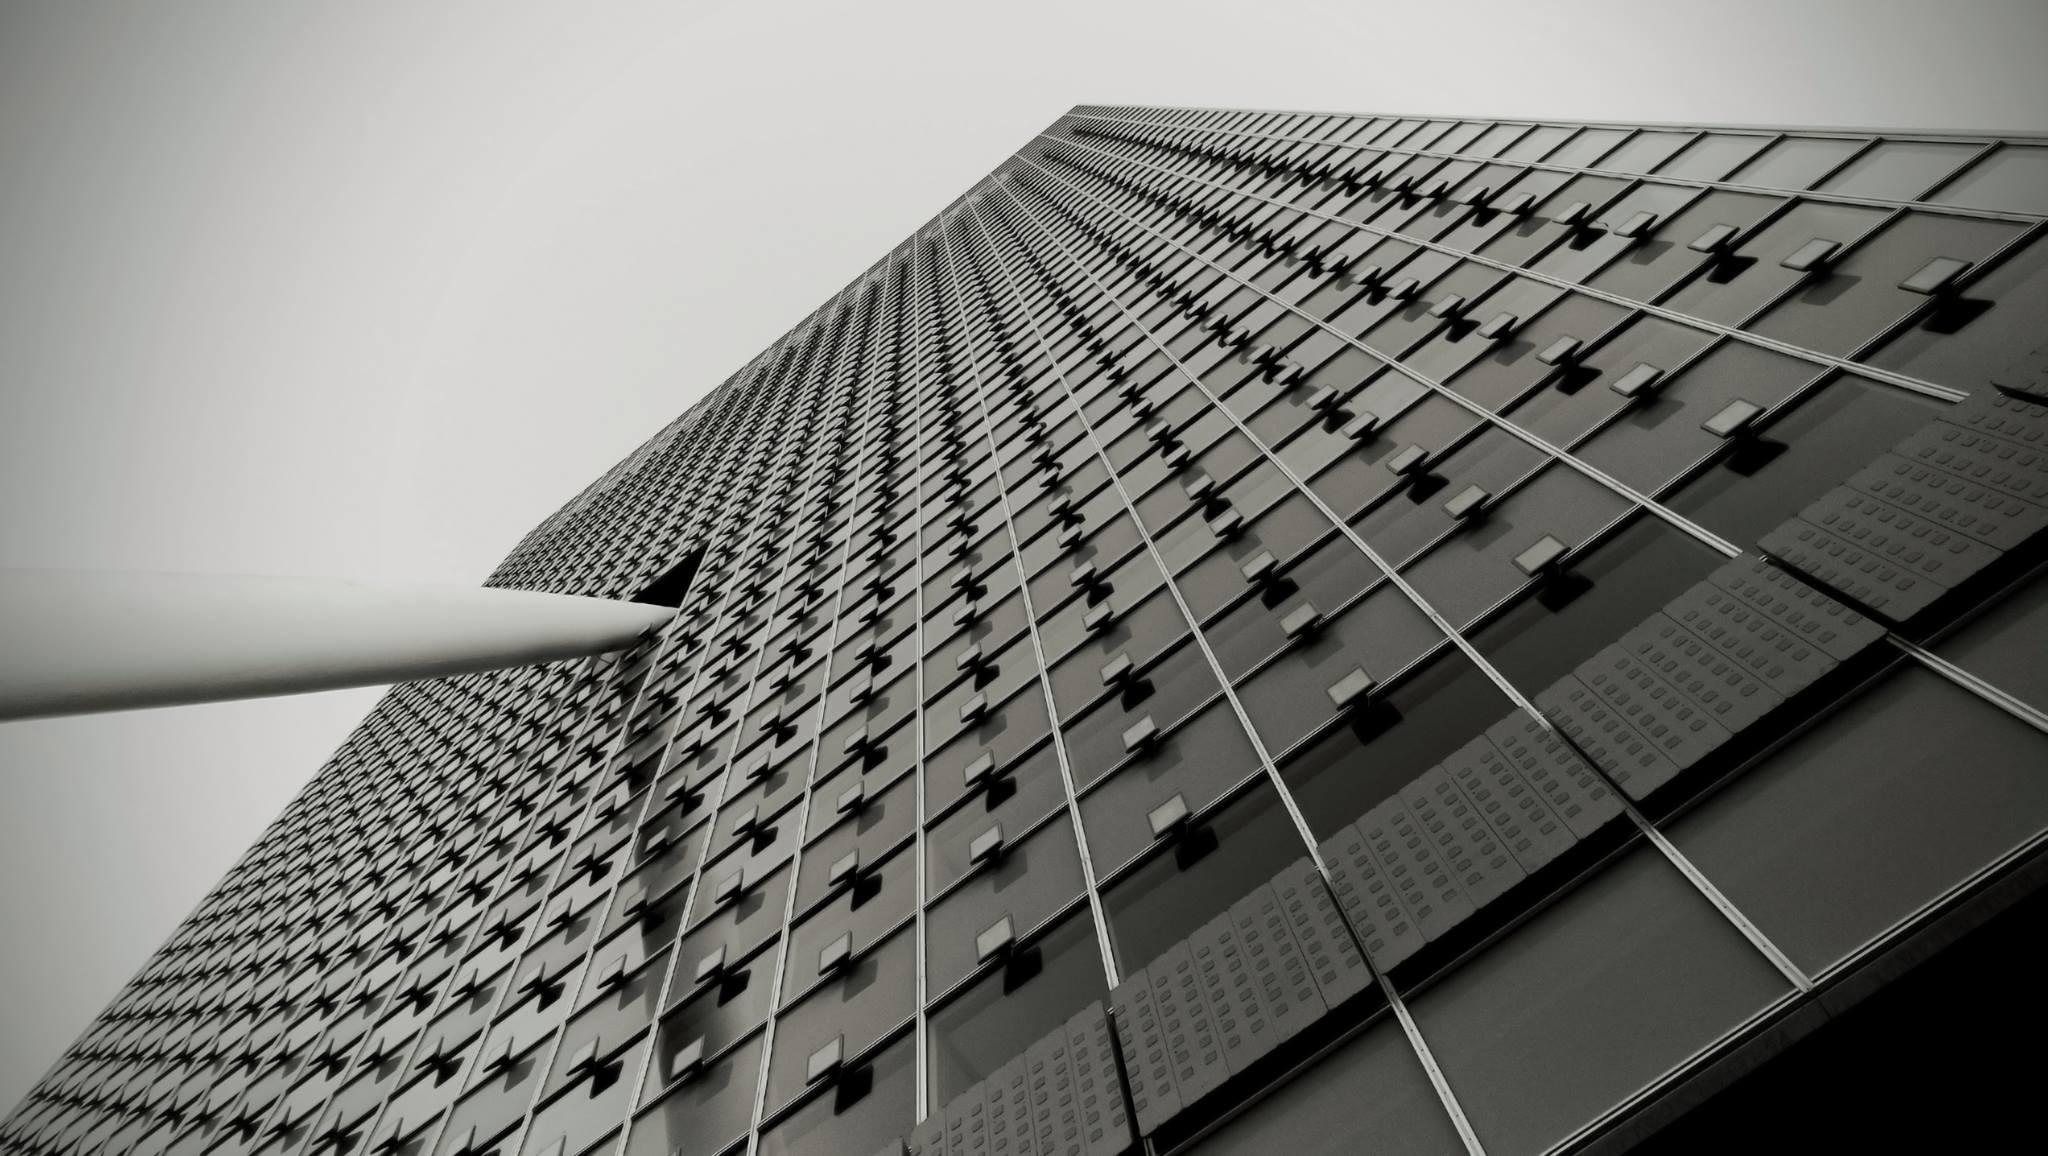 KPN Building by DavidZisky